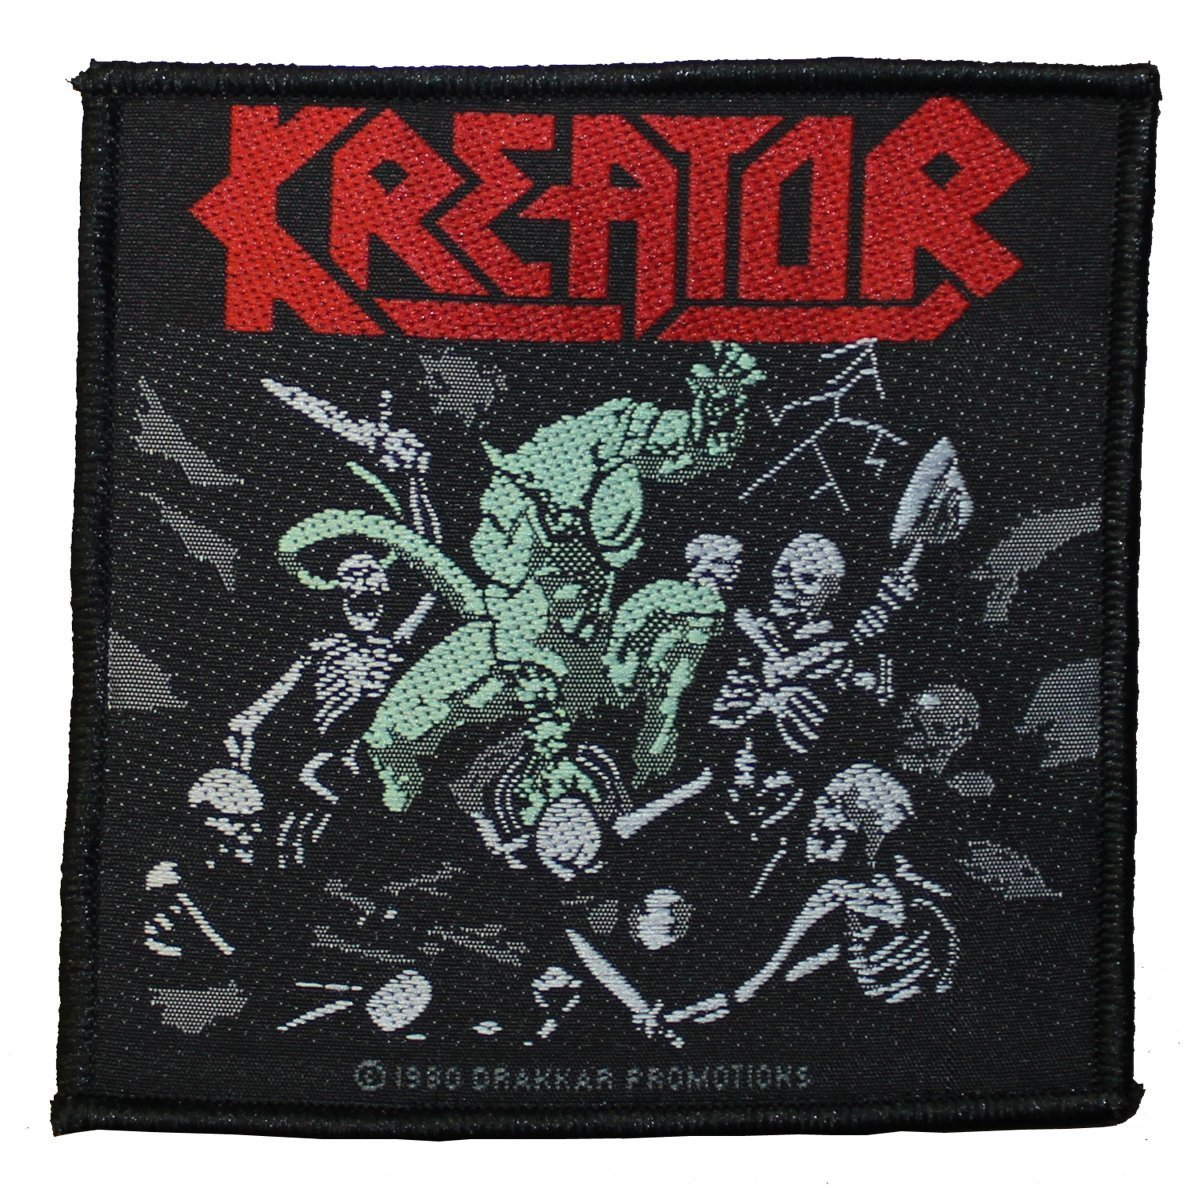 Patch//Aufn/äher, Gewebt Pleasure To Kill SP334 Kreator